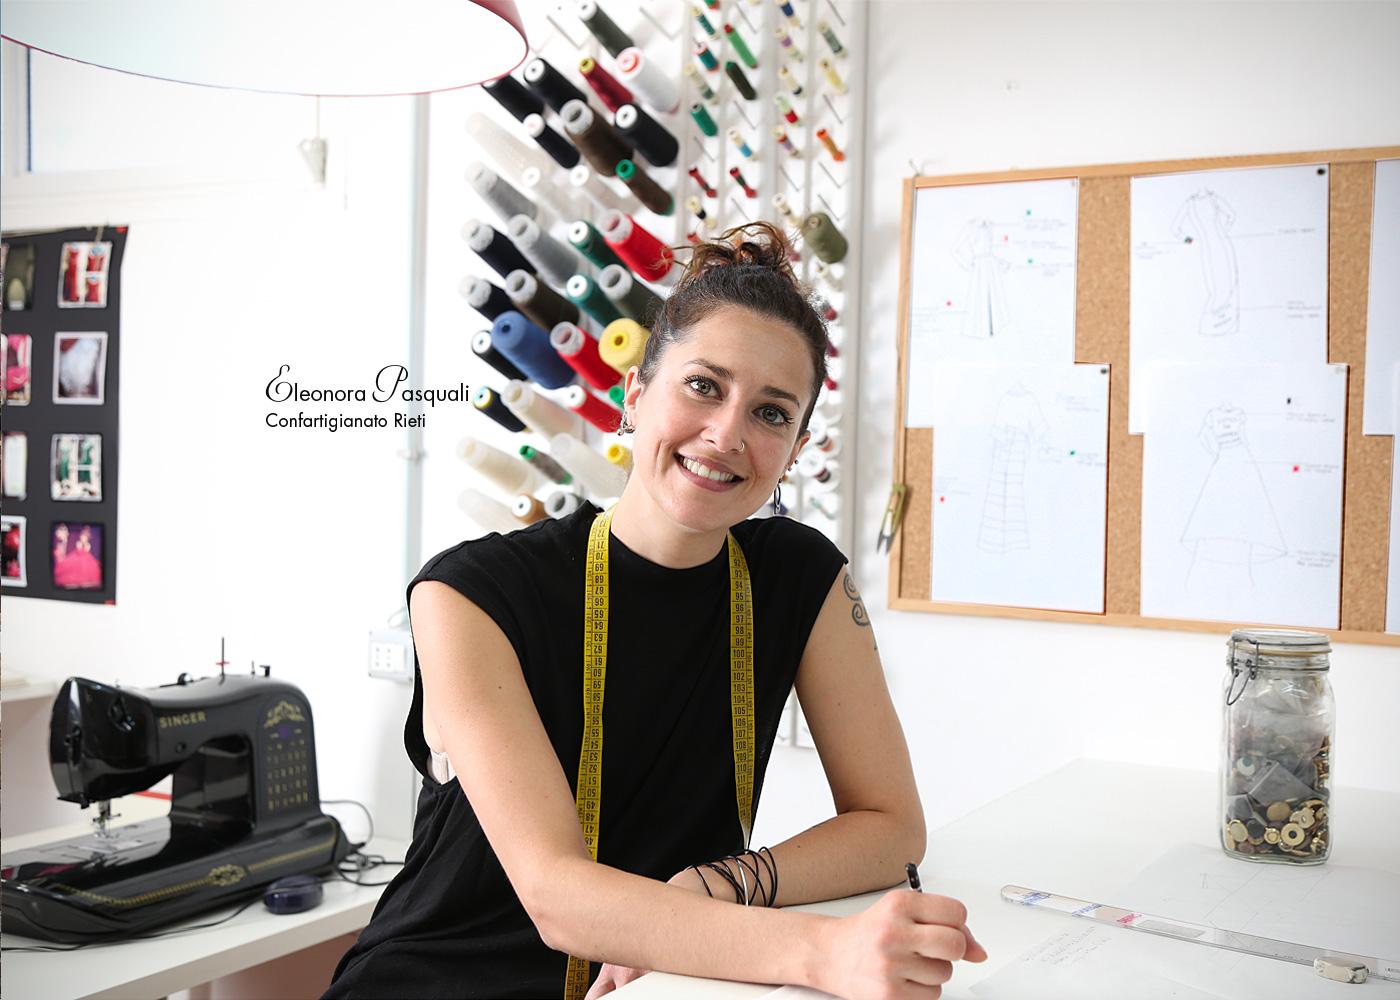 Eleonora Pasquali